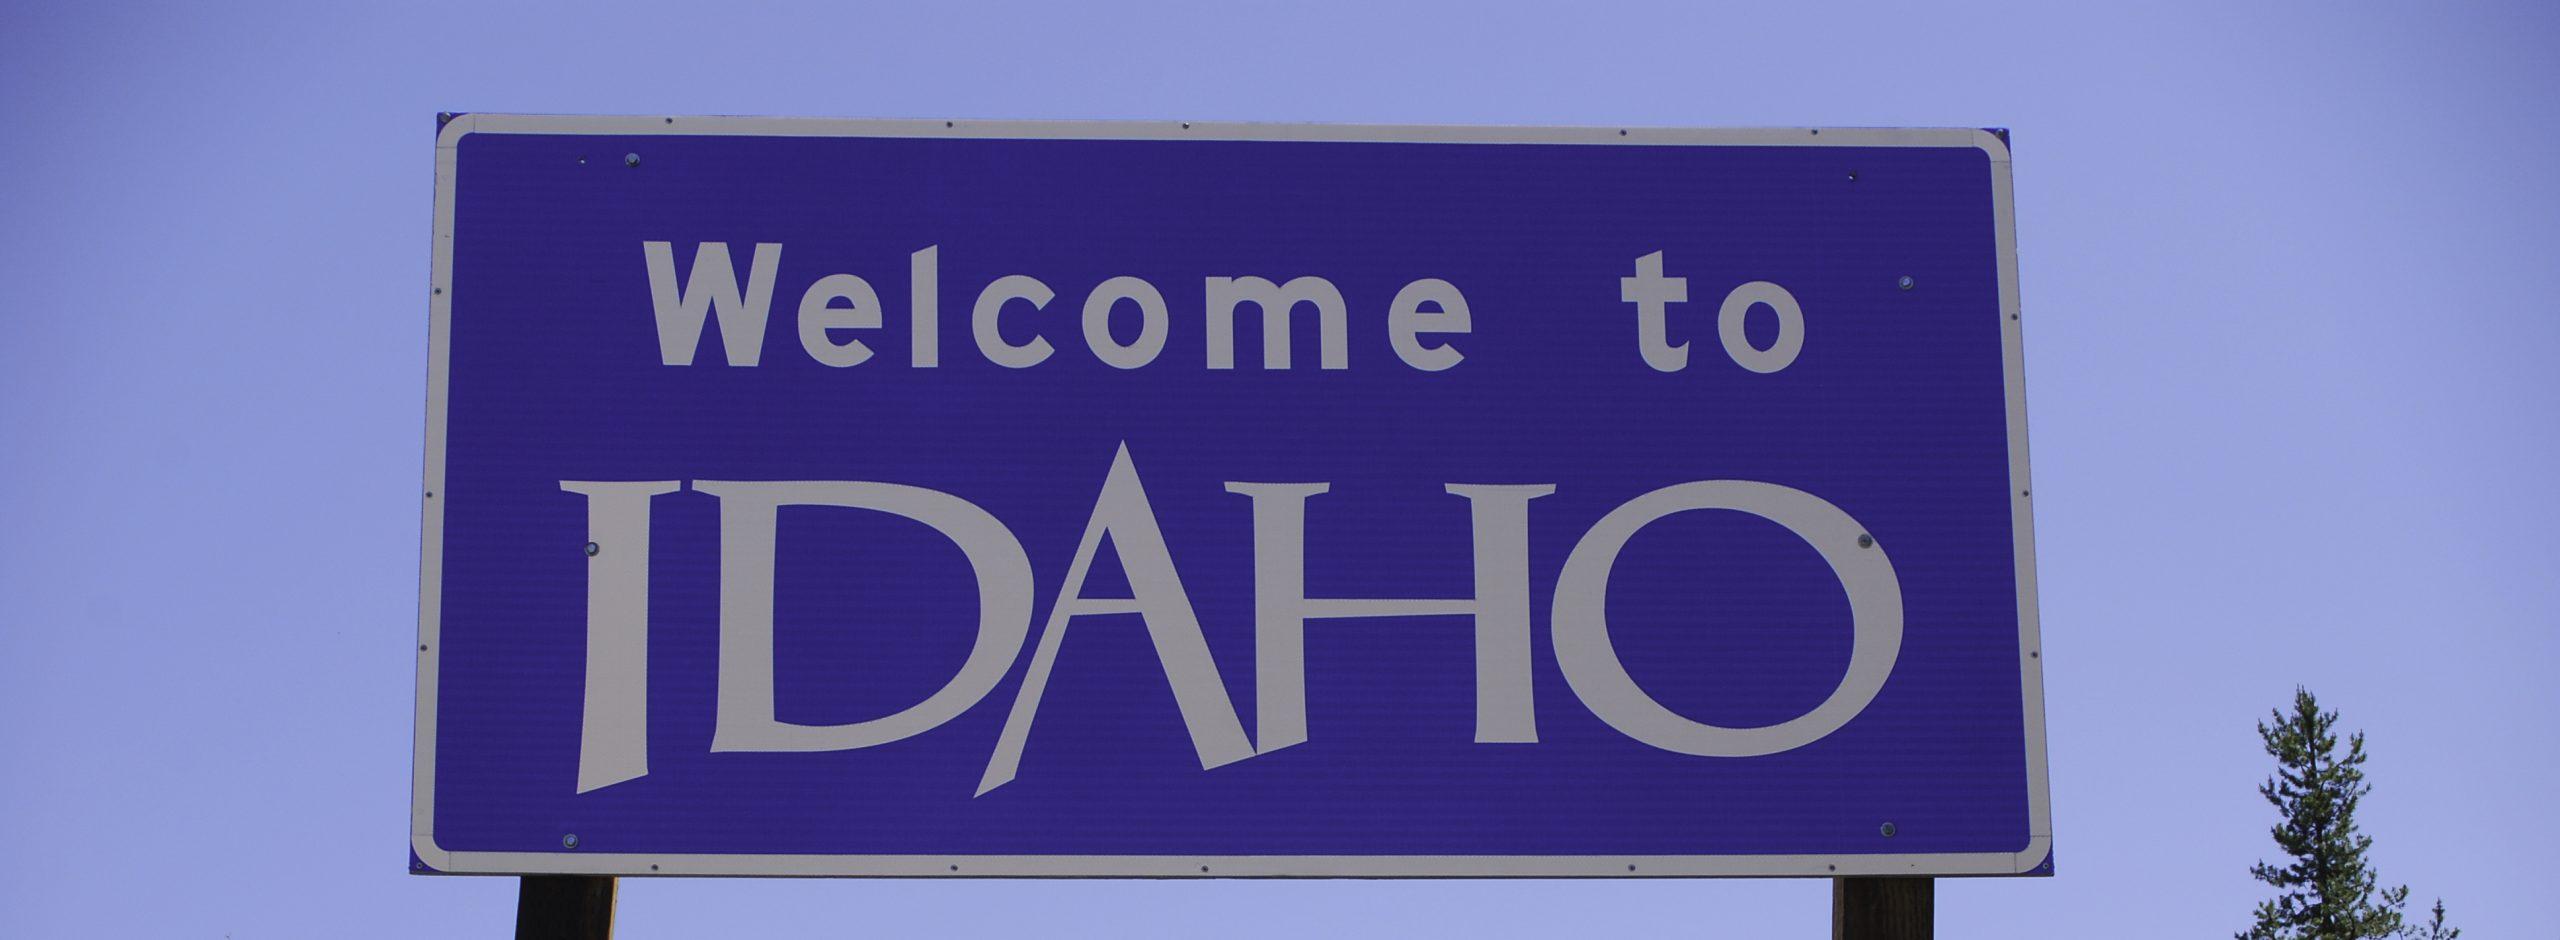 Welcome to Idaho Sign